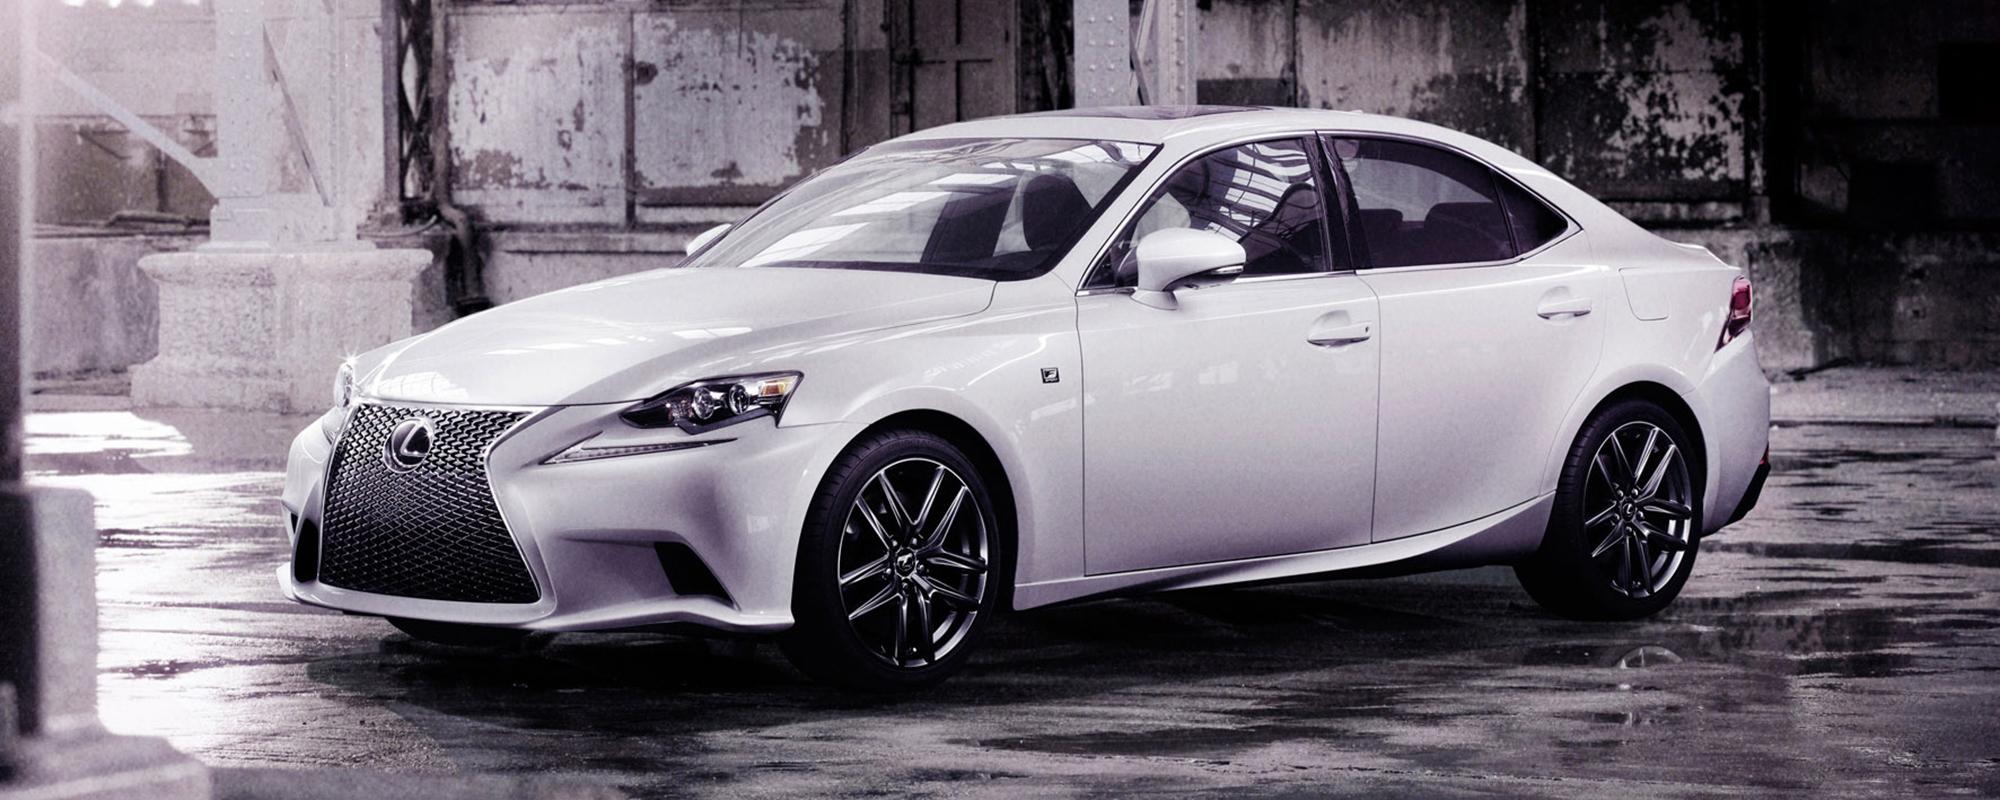 Nieuwe Lexus IS onthuld: design, luxe en dynamiek